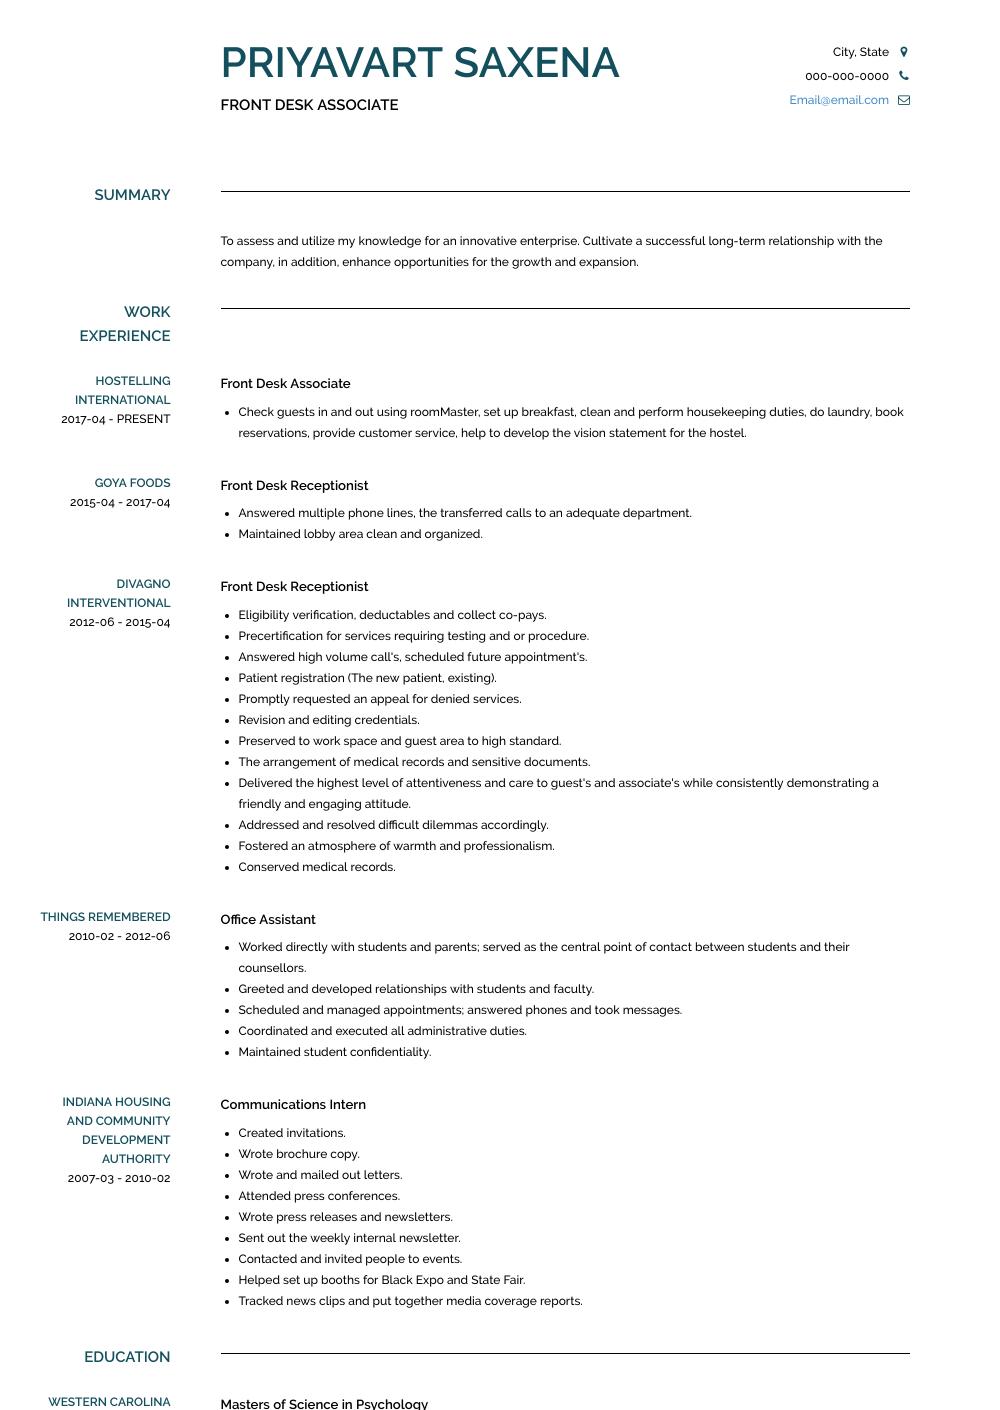 Front Desk Associate Resume Sample